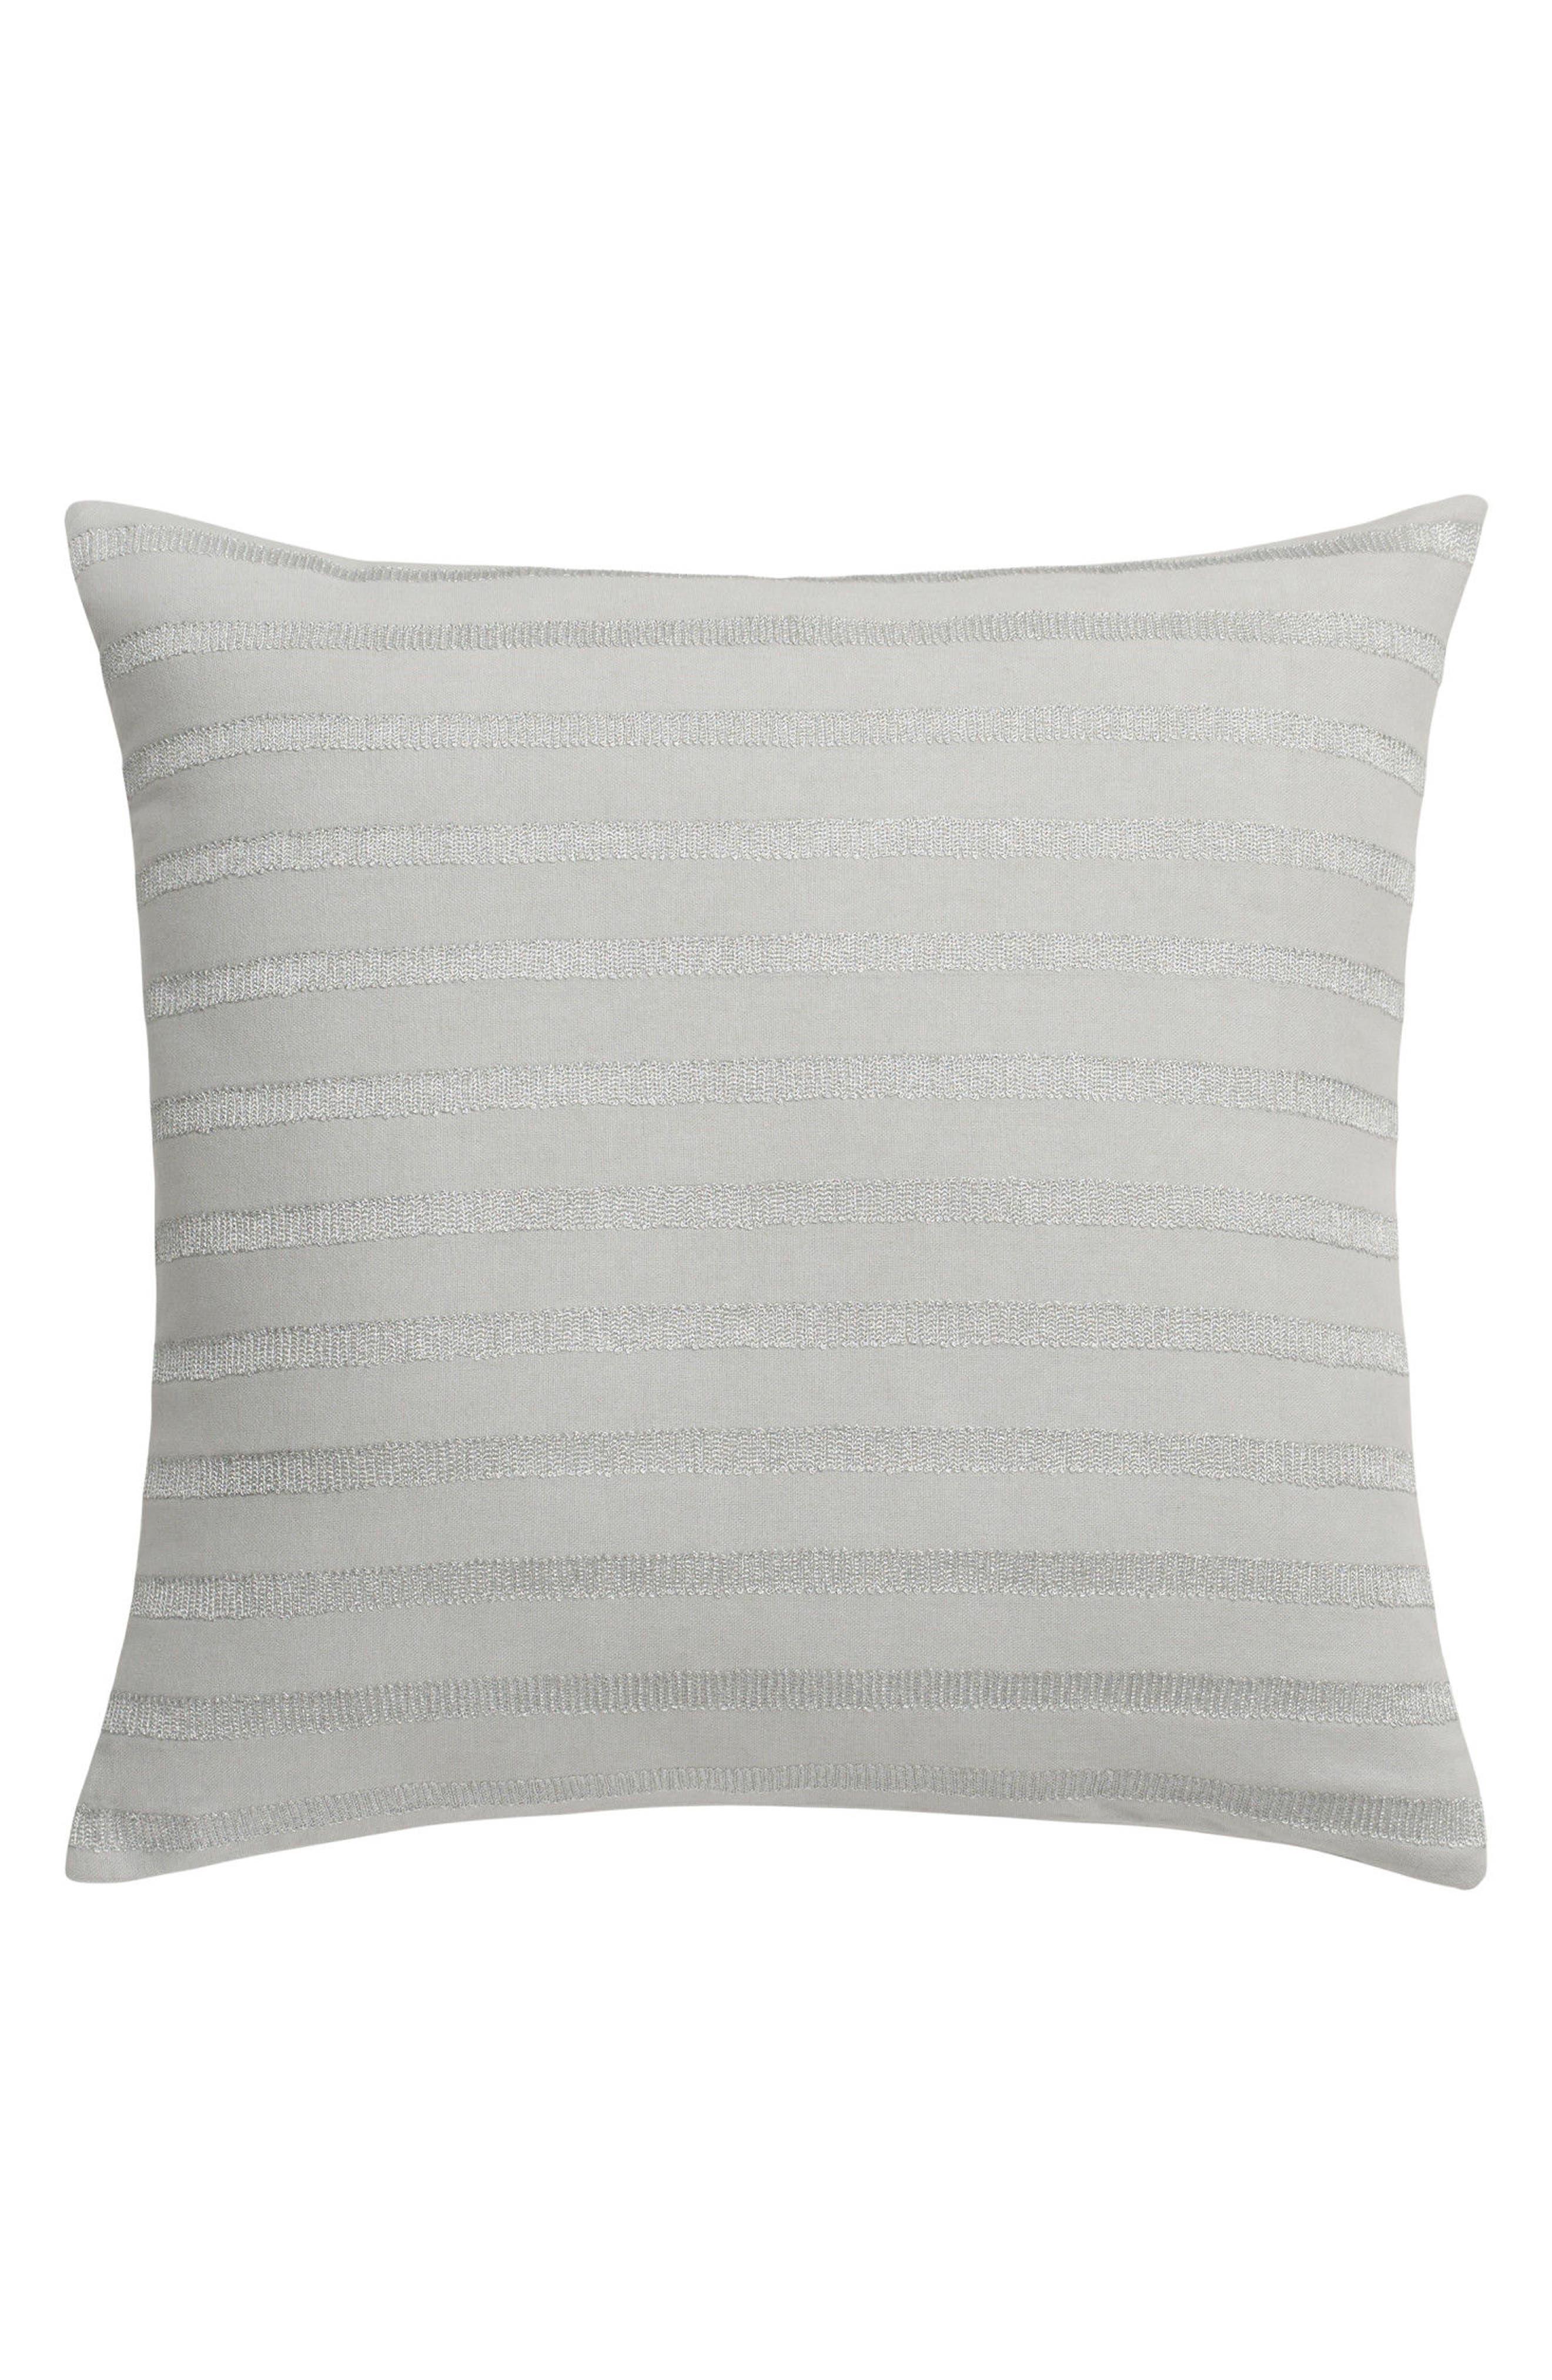 Capri Stripe Accent Pillow,                         Main,                         color, 020